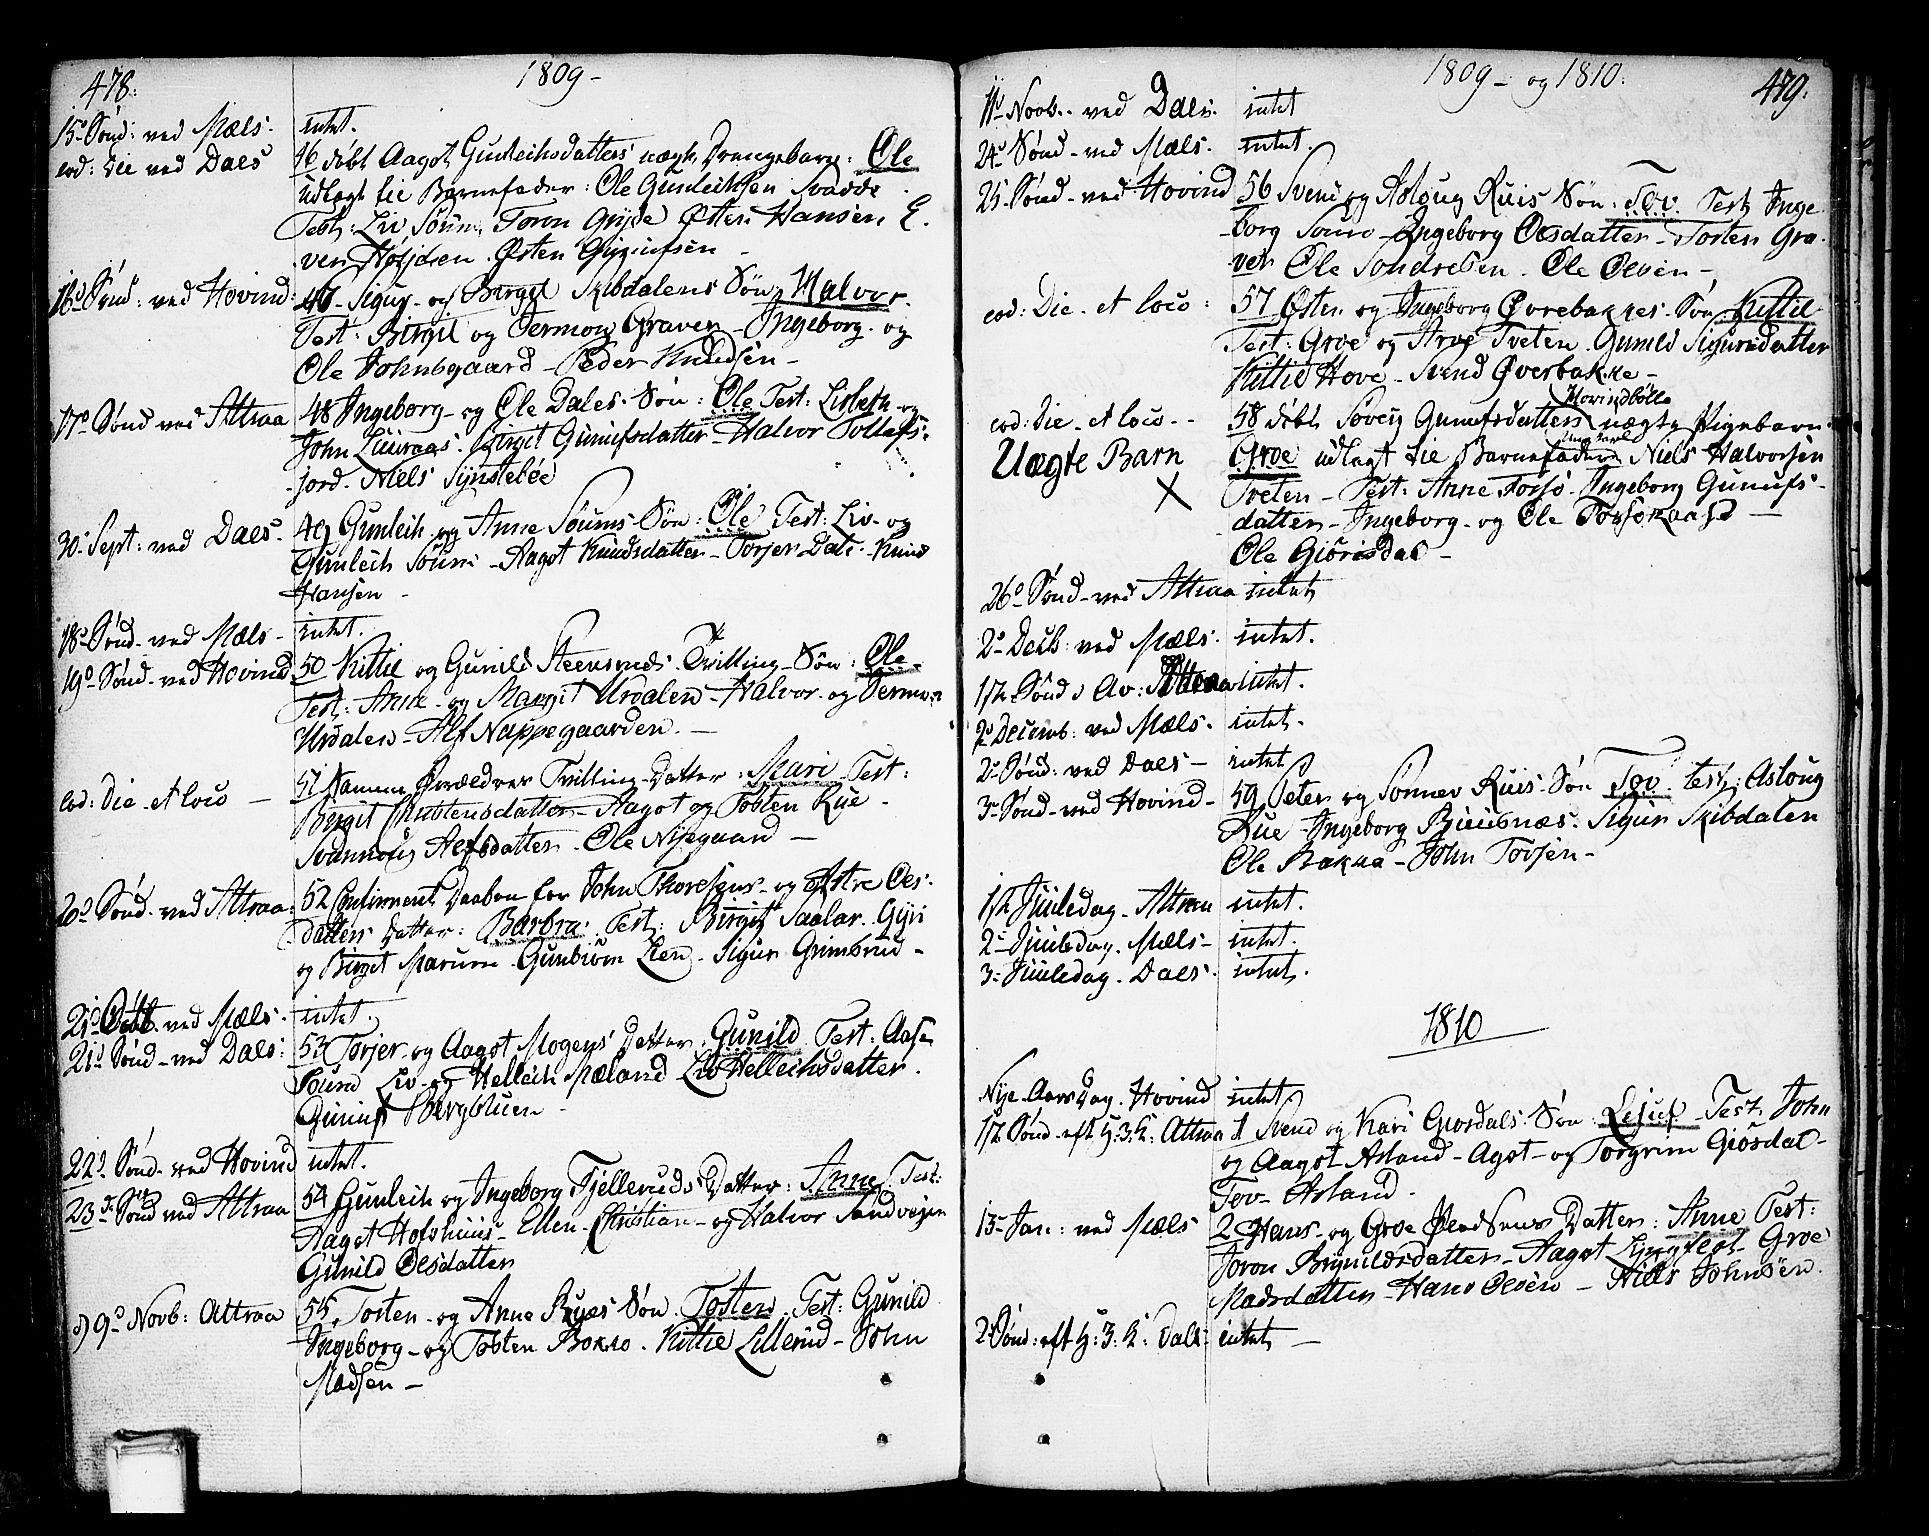 SAKO, Tinn kirkebøker, F/Fa/L0002: Ministerialbok nr. I 2, 1757-1810, s. 478-479